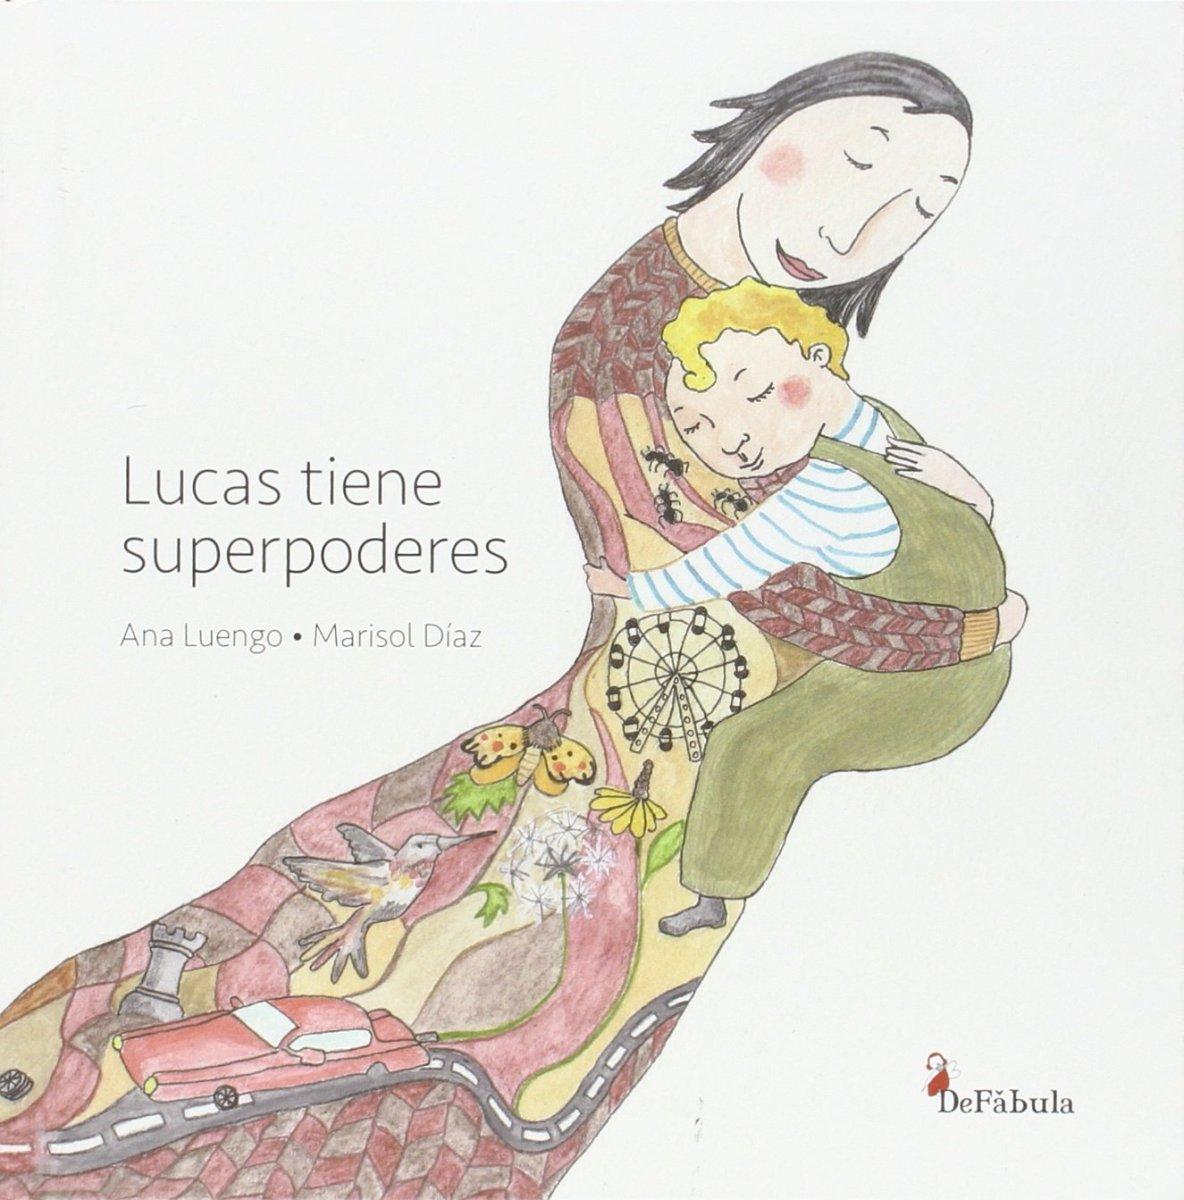 #HoyLeemos Lucas tiene superpoderes #TEA